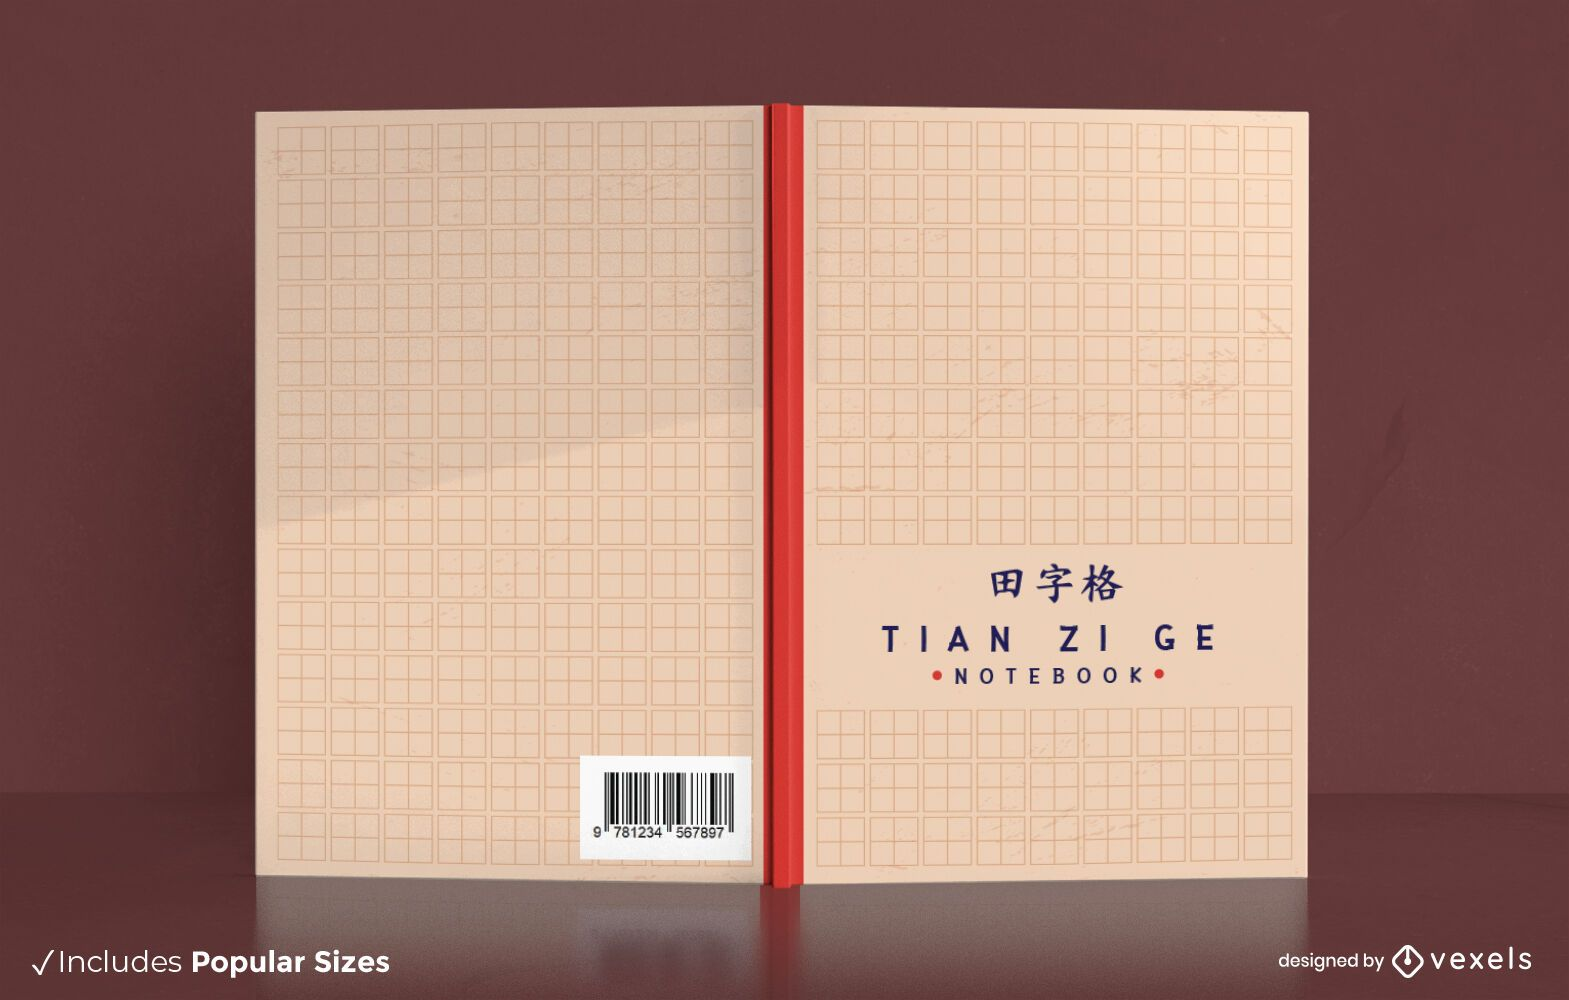 Diseño de portada de libro de cuadrícula de escritura china